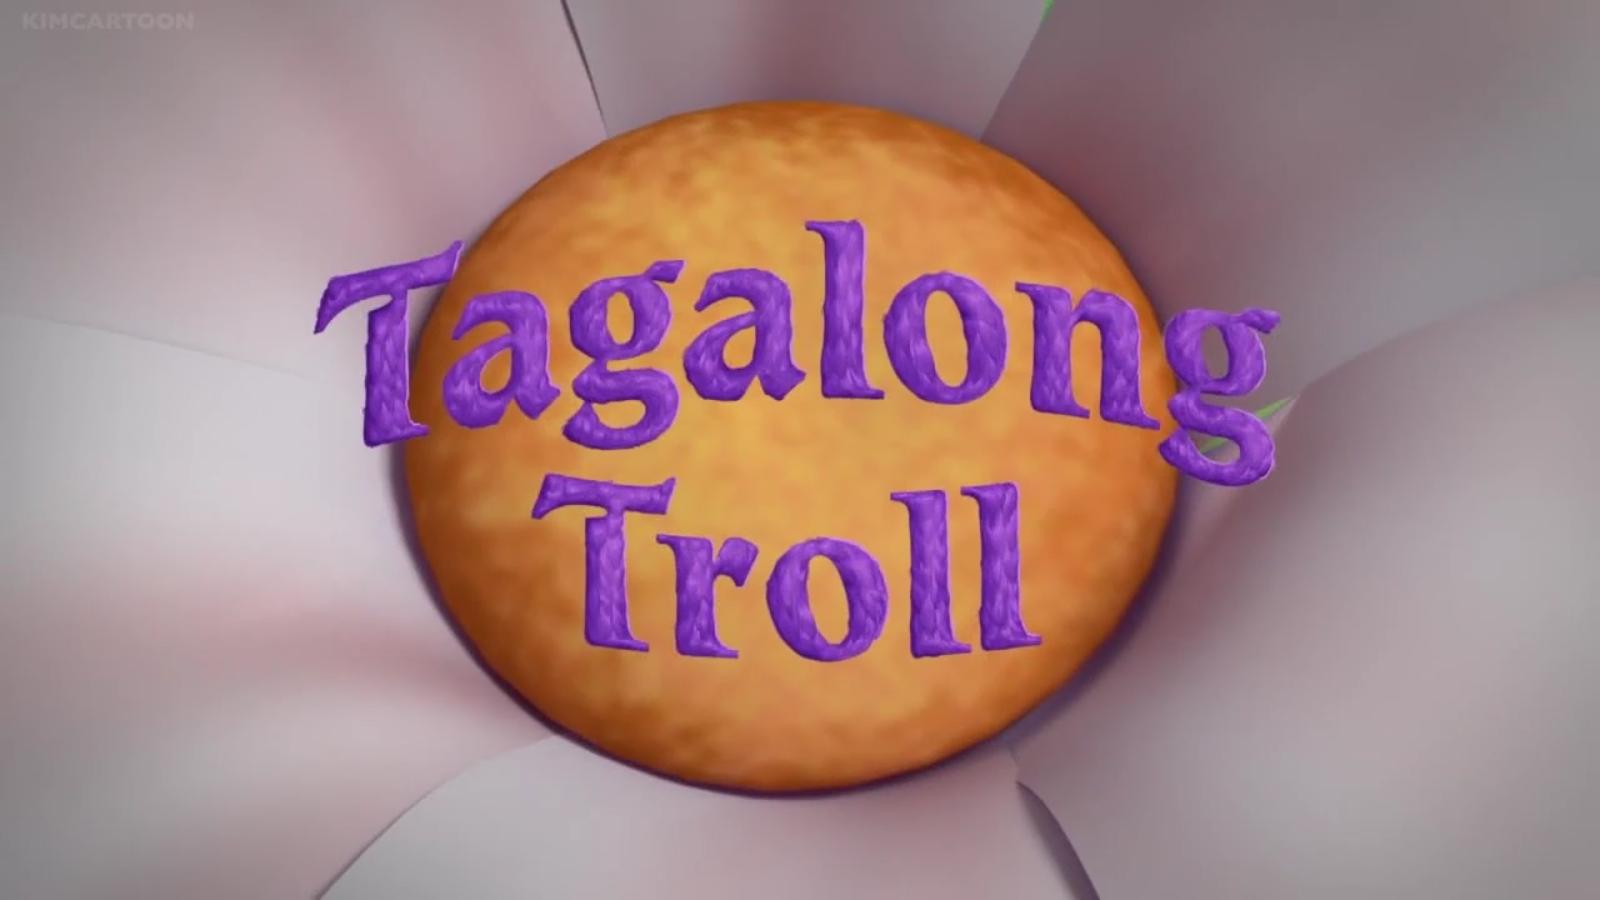 Tagalong Troll | Disney Wiki | FANDOM powered by Wikia